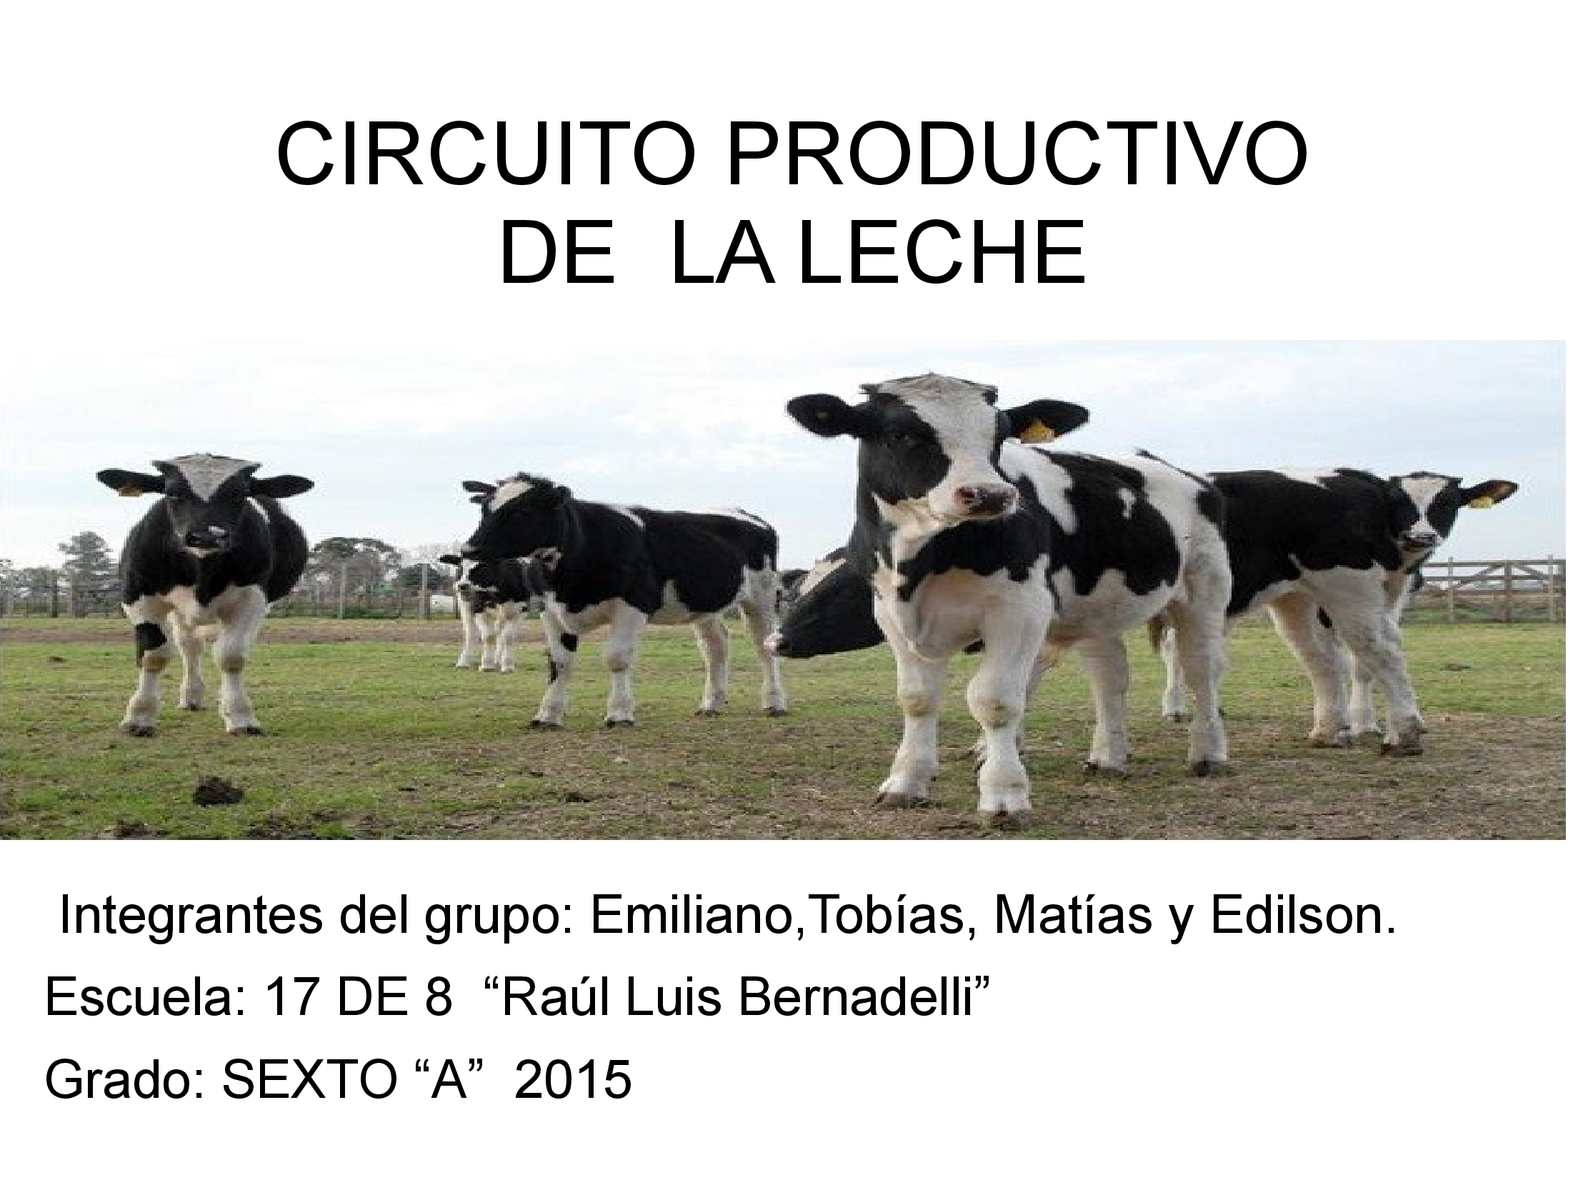 Circuito Productivo De La Leche : Calaméo circuito productivo de la leche emi mati tobi edil